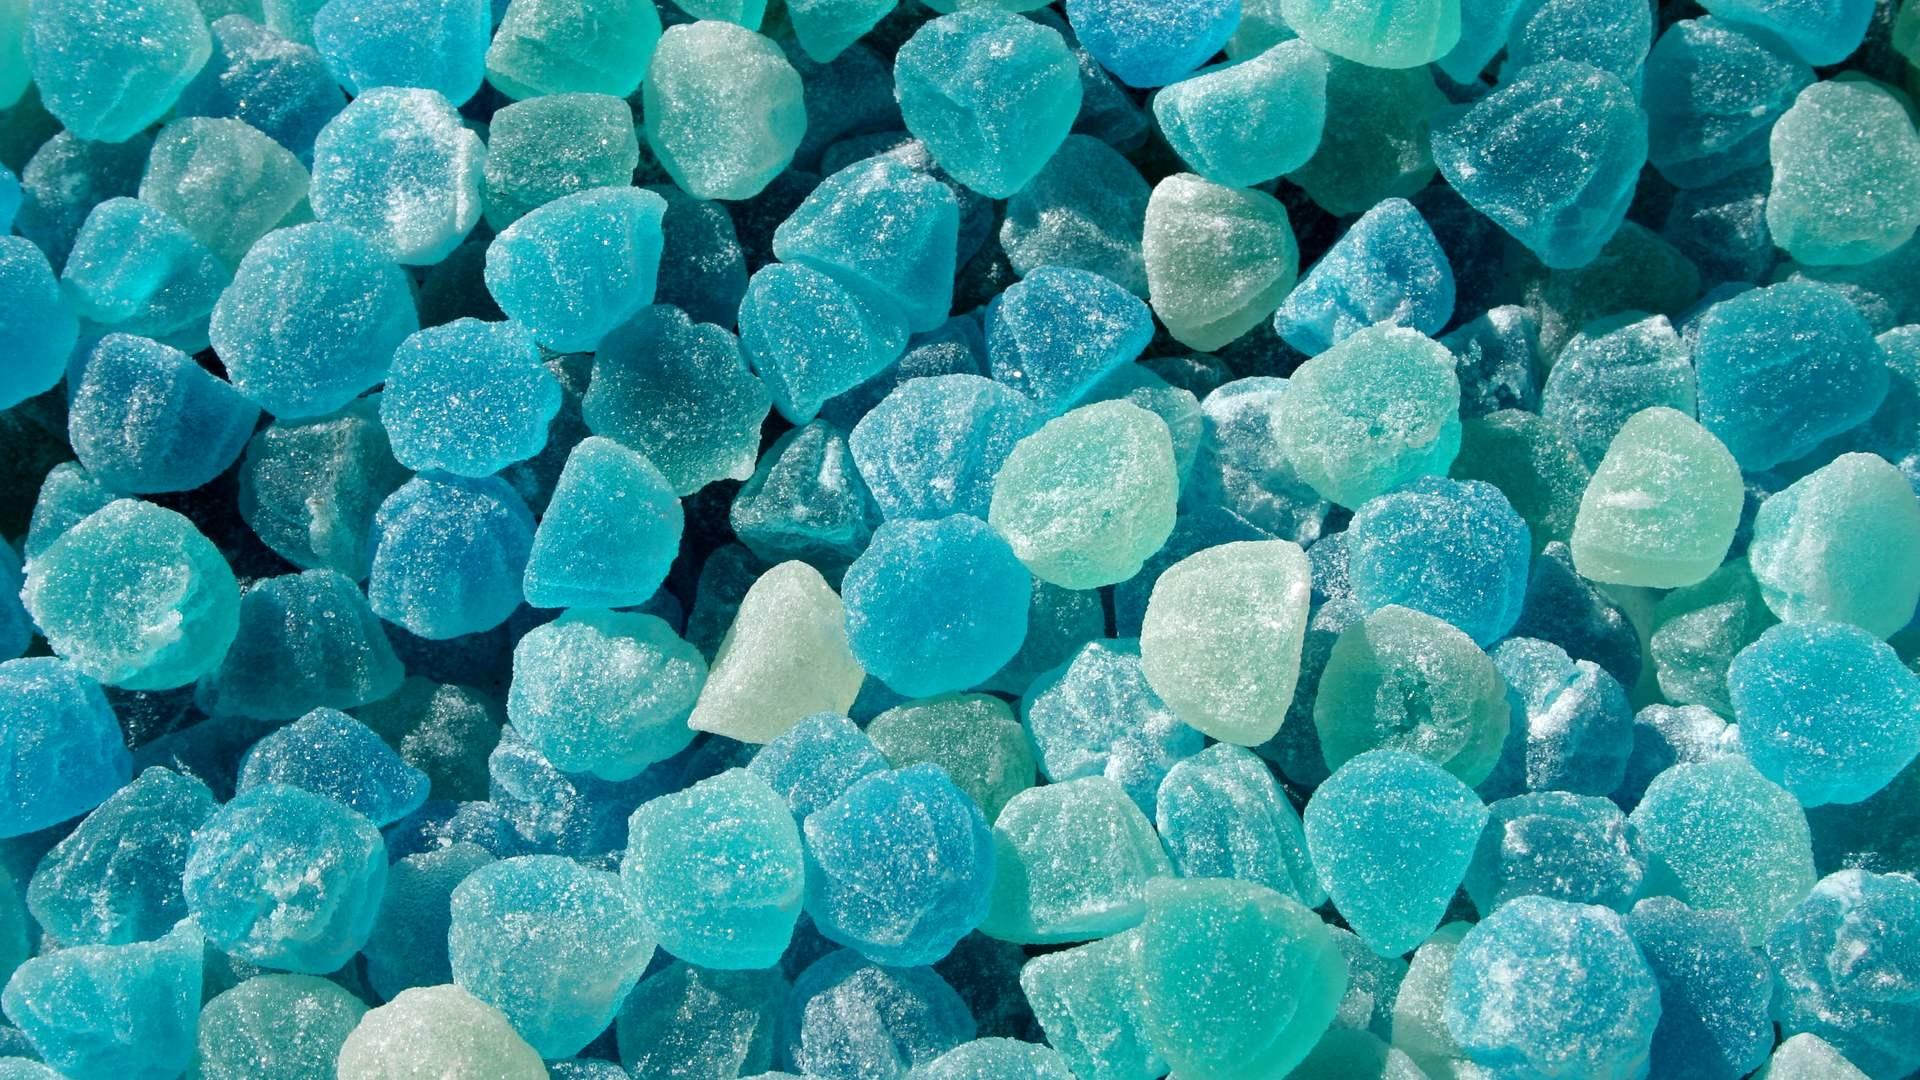 Sfondi Verde Blu Zucchero Turchese Acqua Dolce Gioielleria